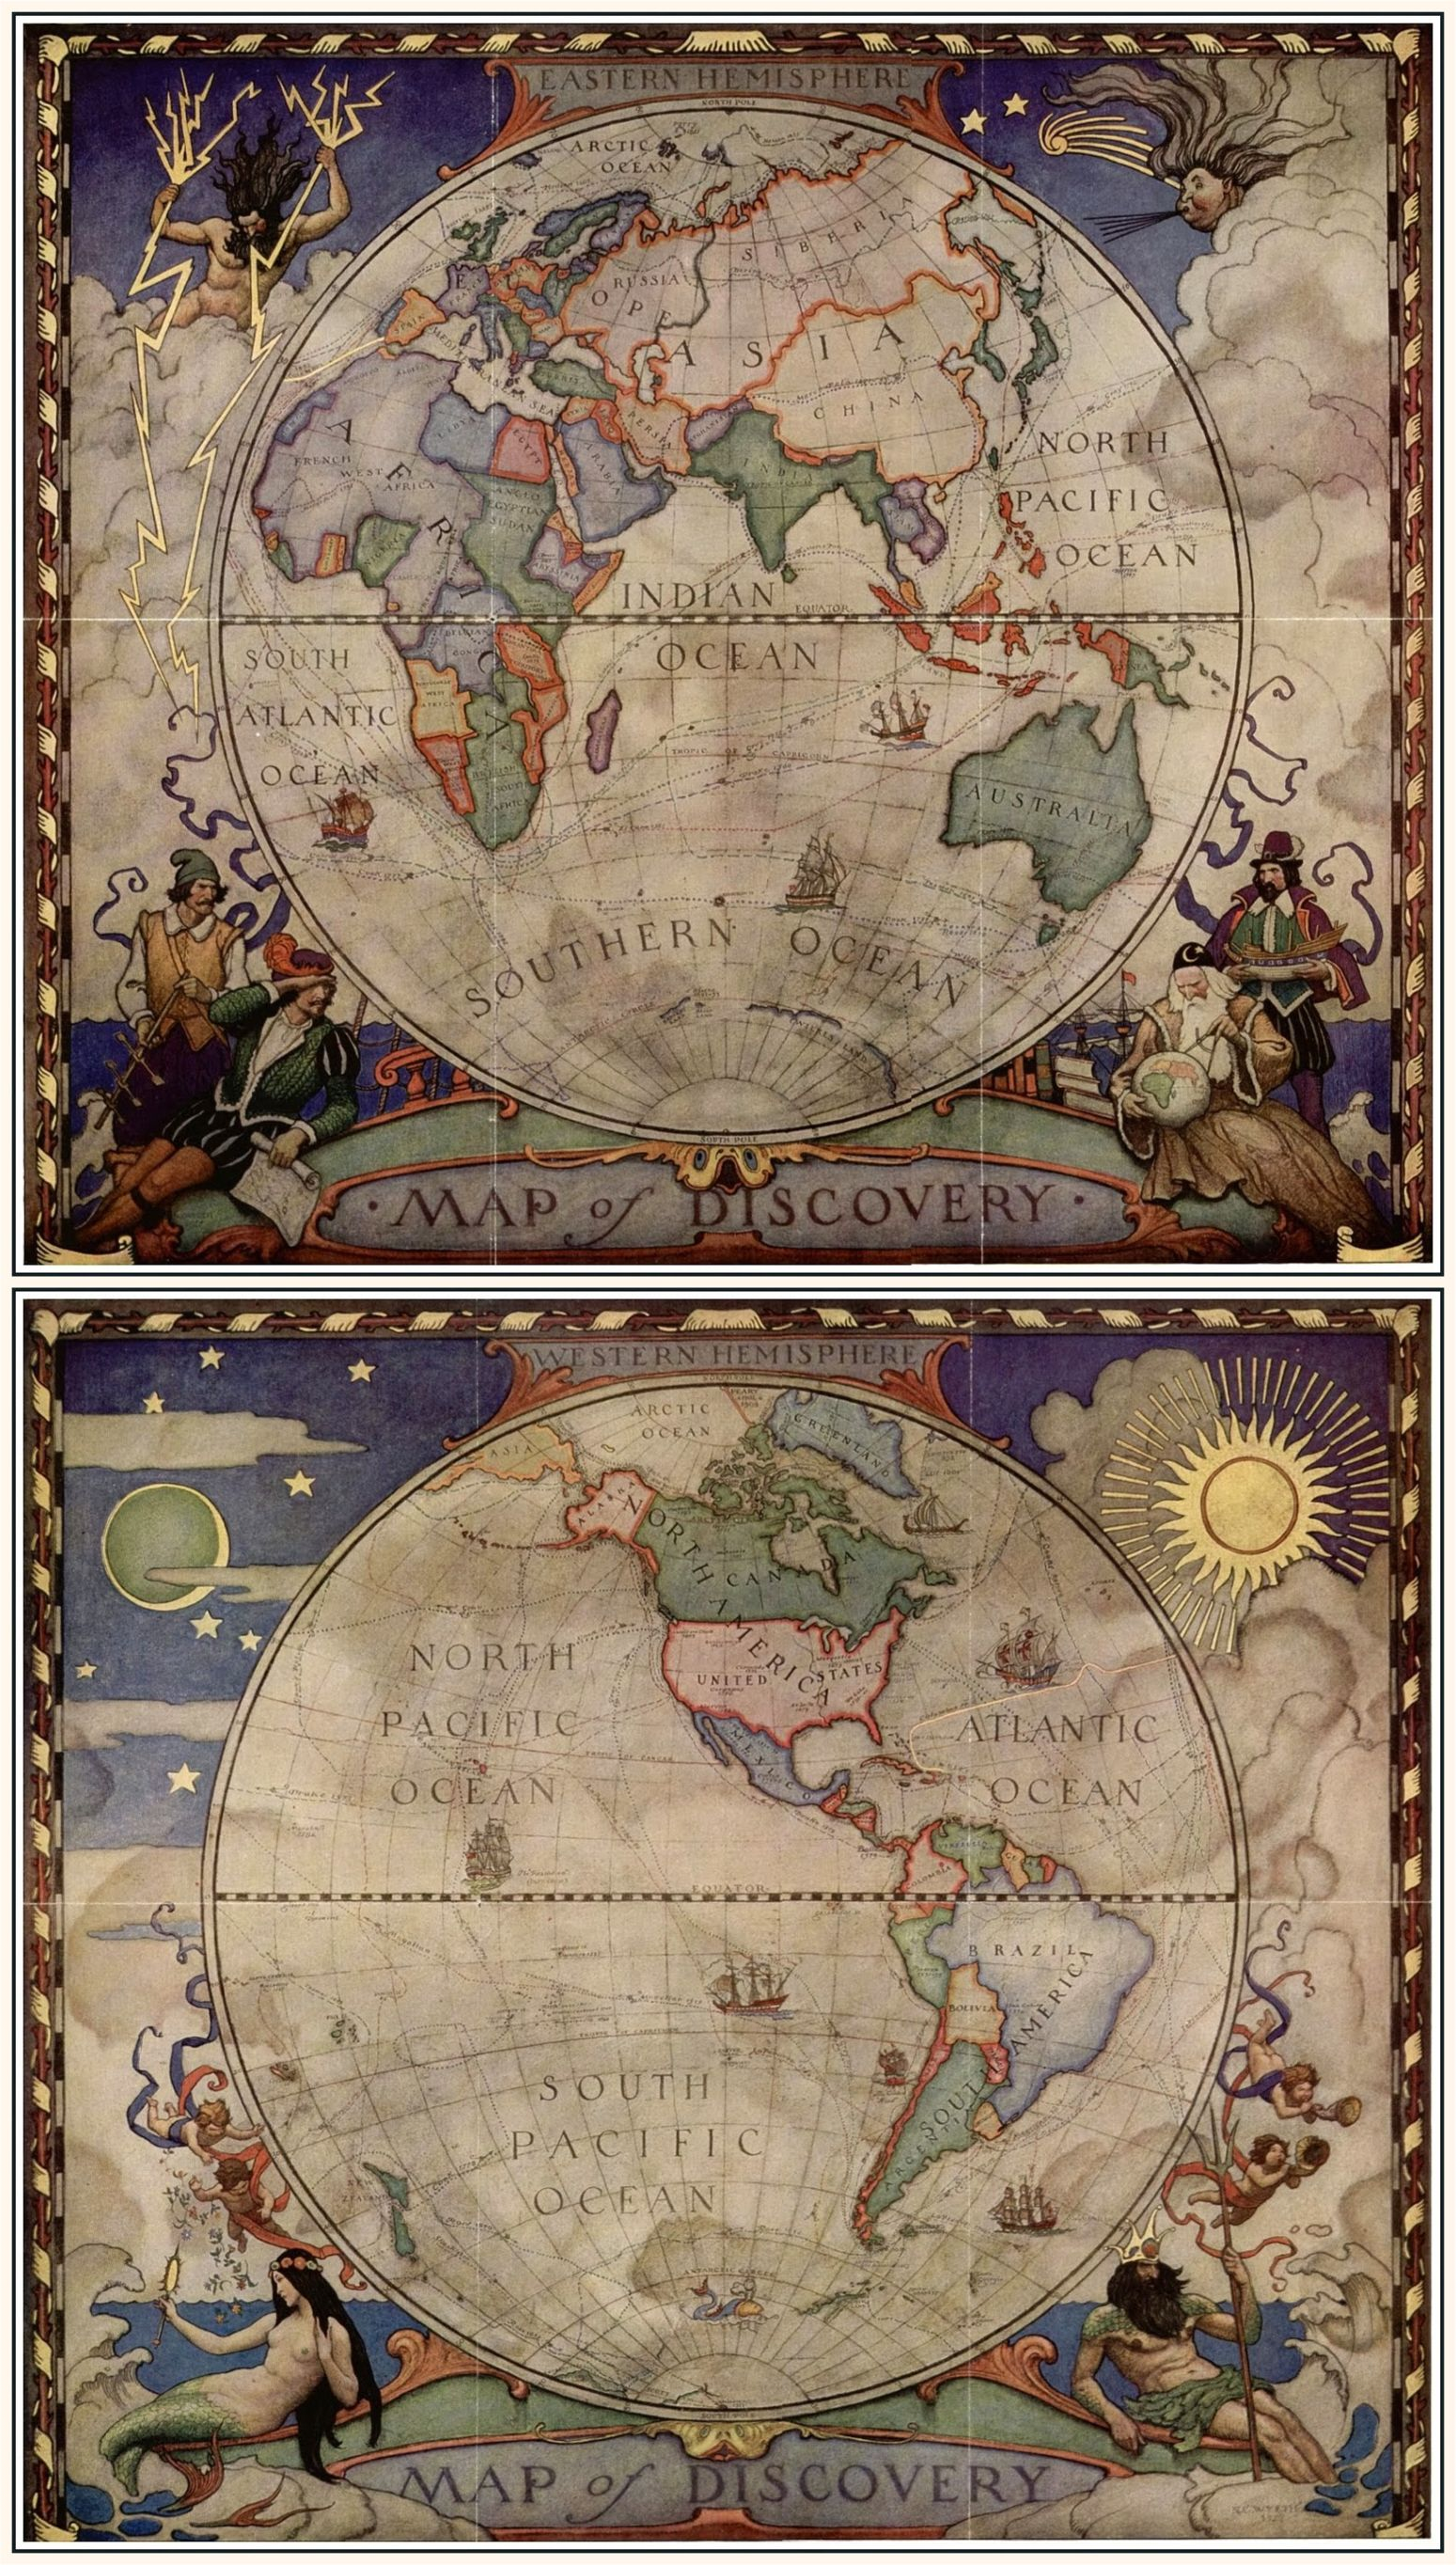 Maps of Eastern & Western Hemispheres by N.C. Wyeth for ...